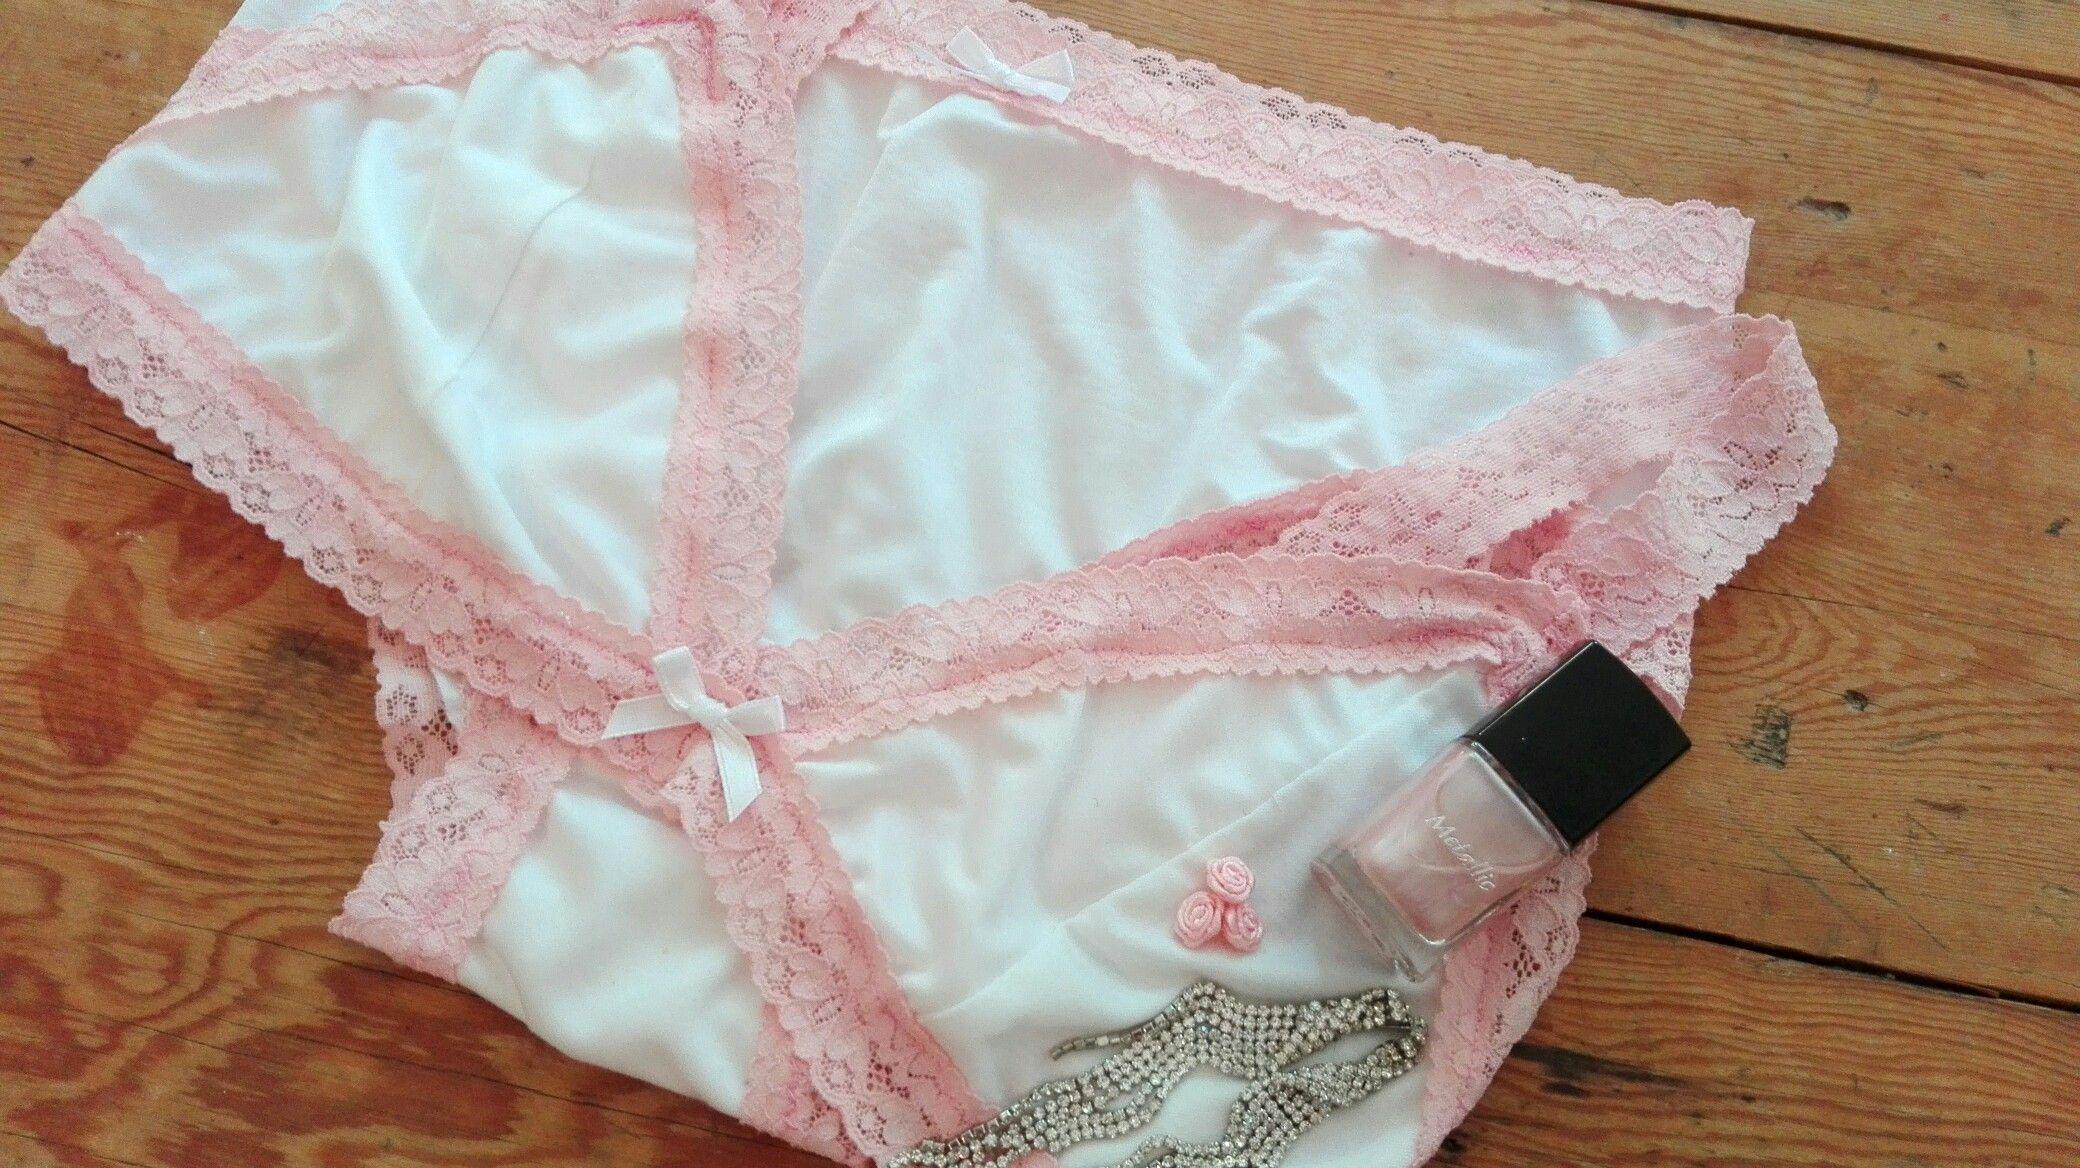 Homemade panties